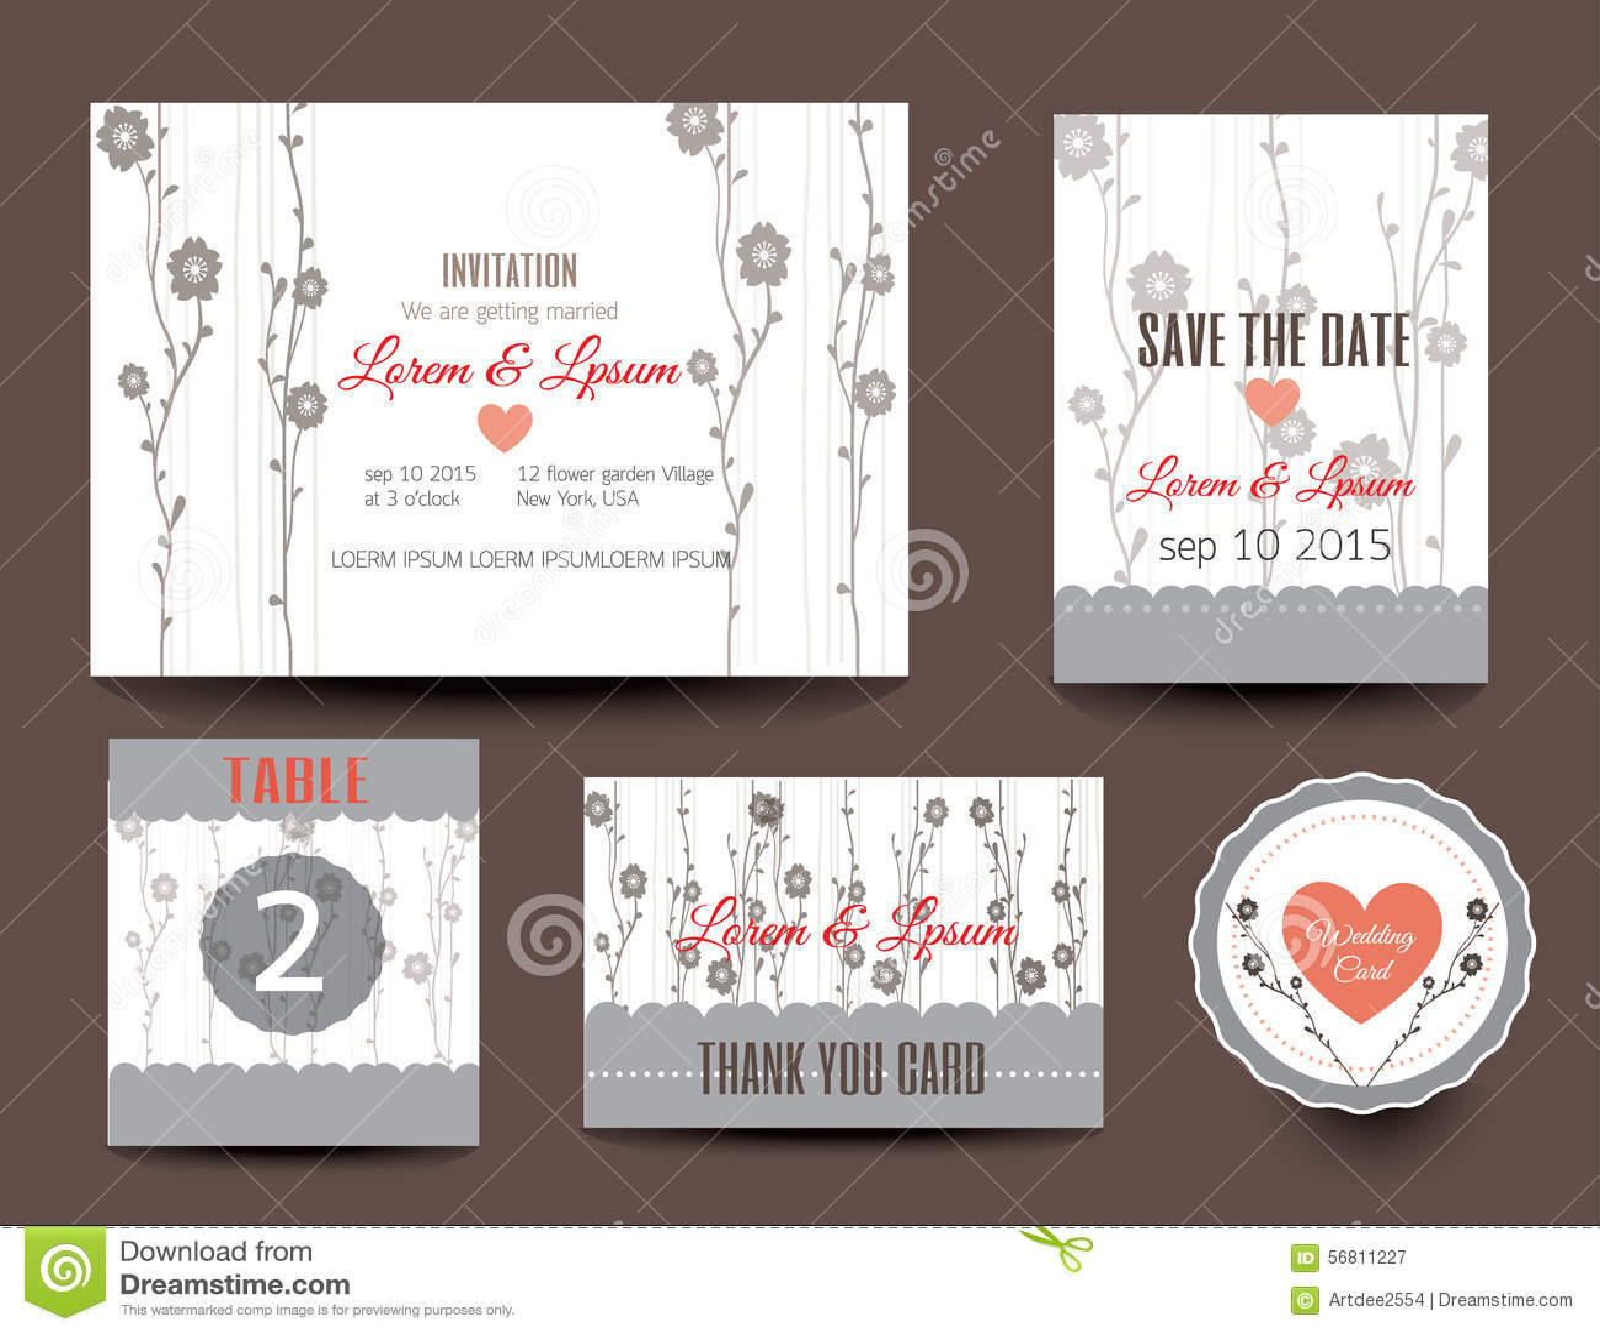 thank you cards postcards thank you wedding cards Glitter Wedding Thank You Cards